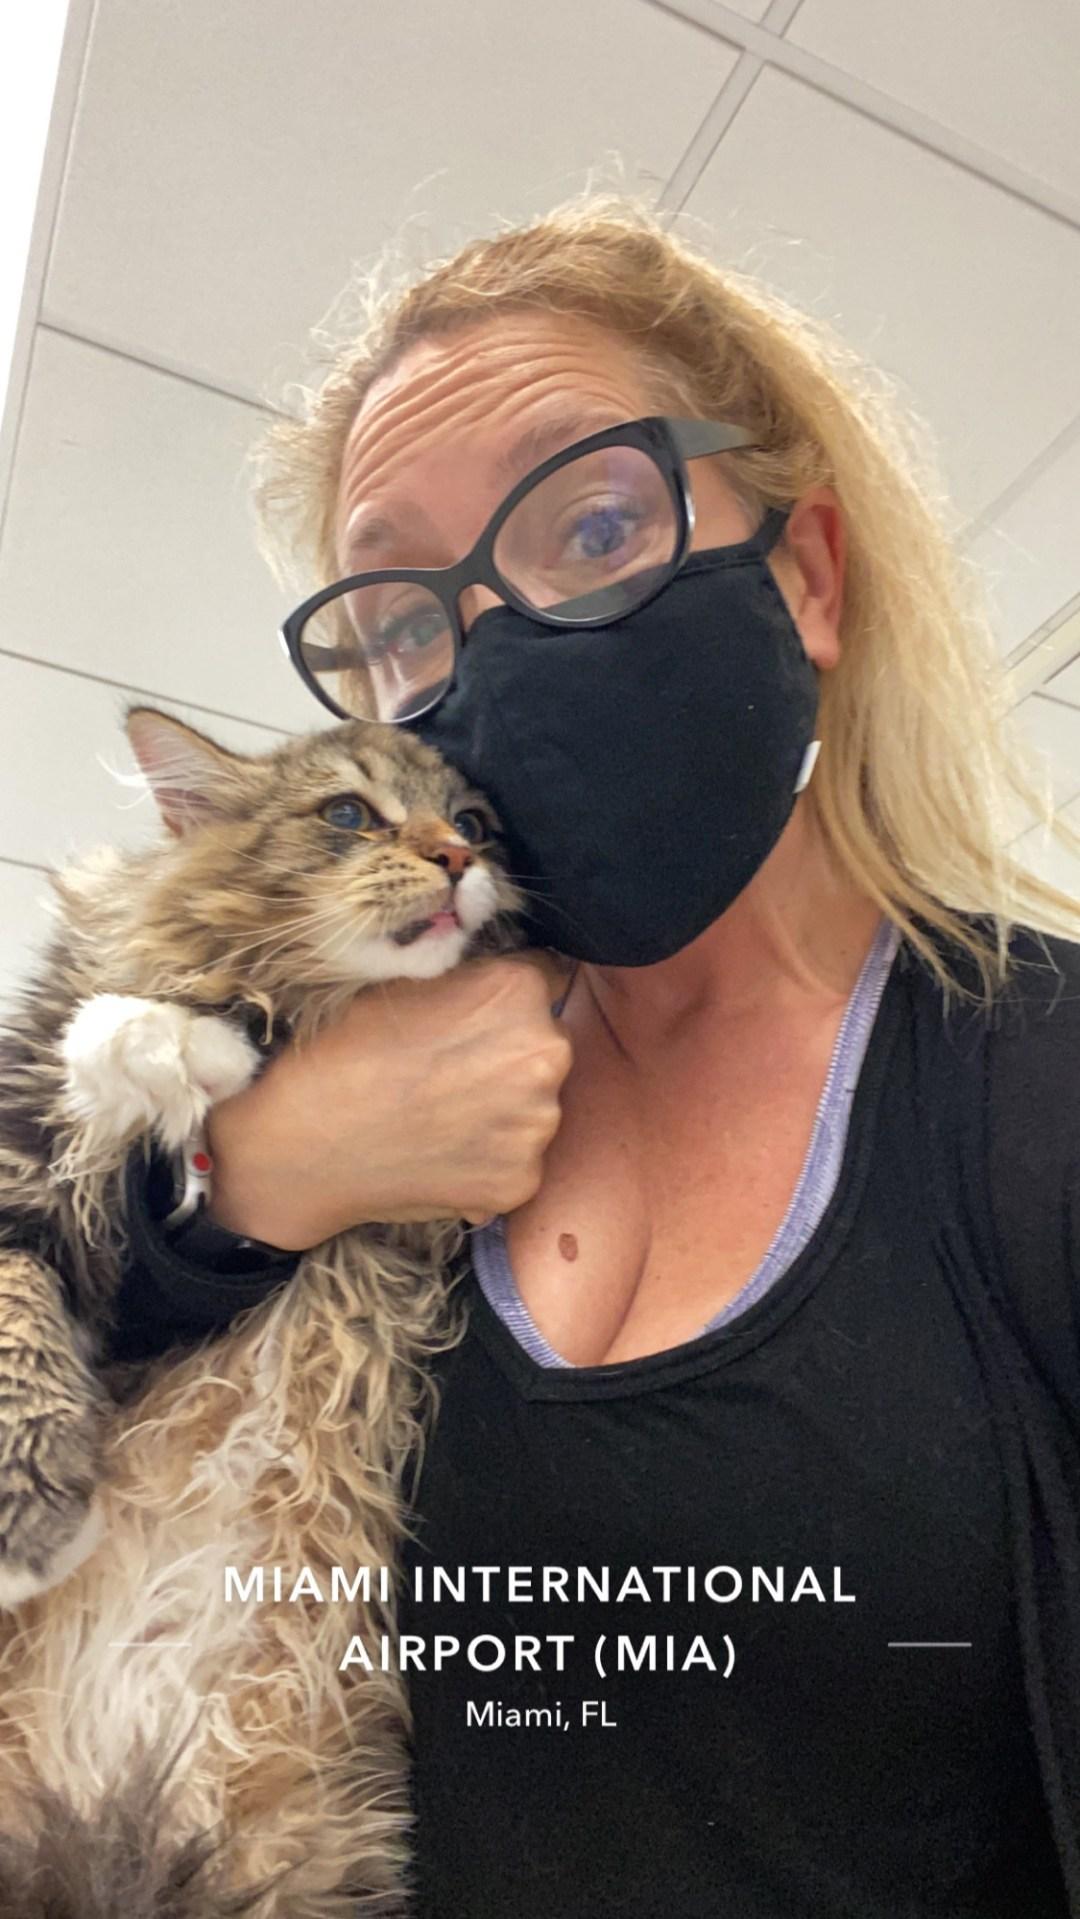 Ground Transport Cat From Miami to Orlando